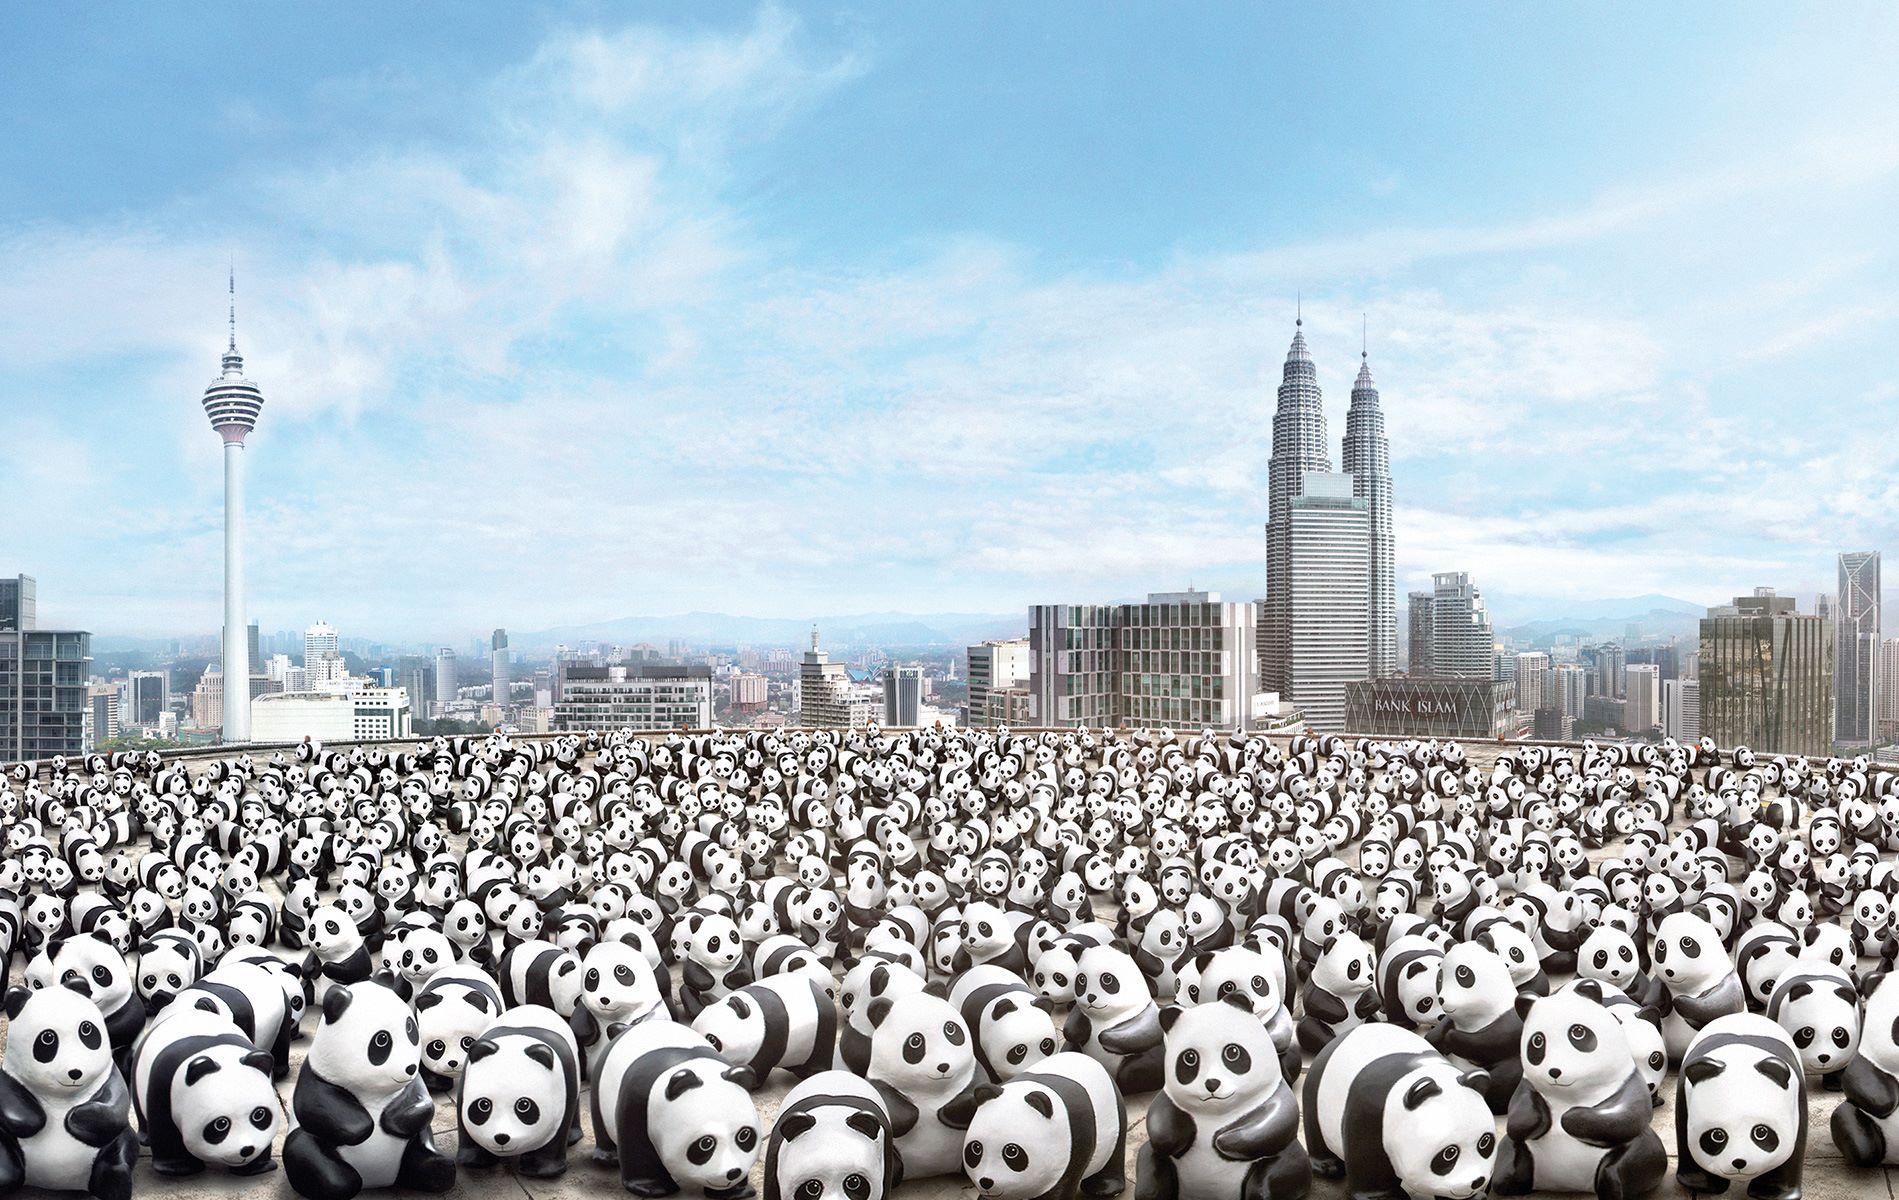 1600-Pandas-Malaisie-3